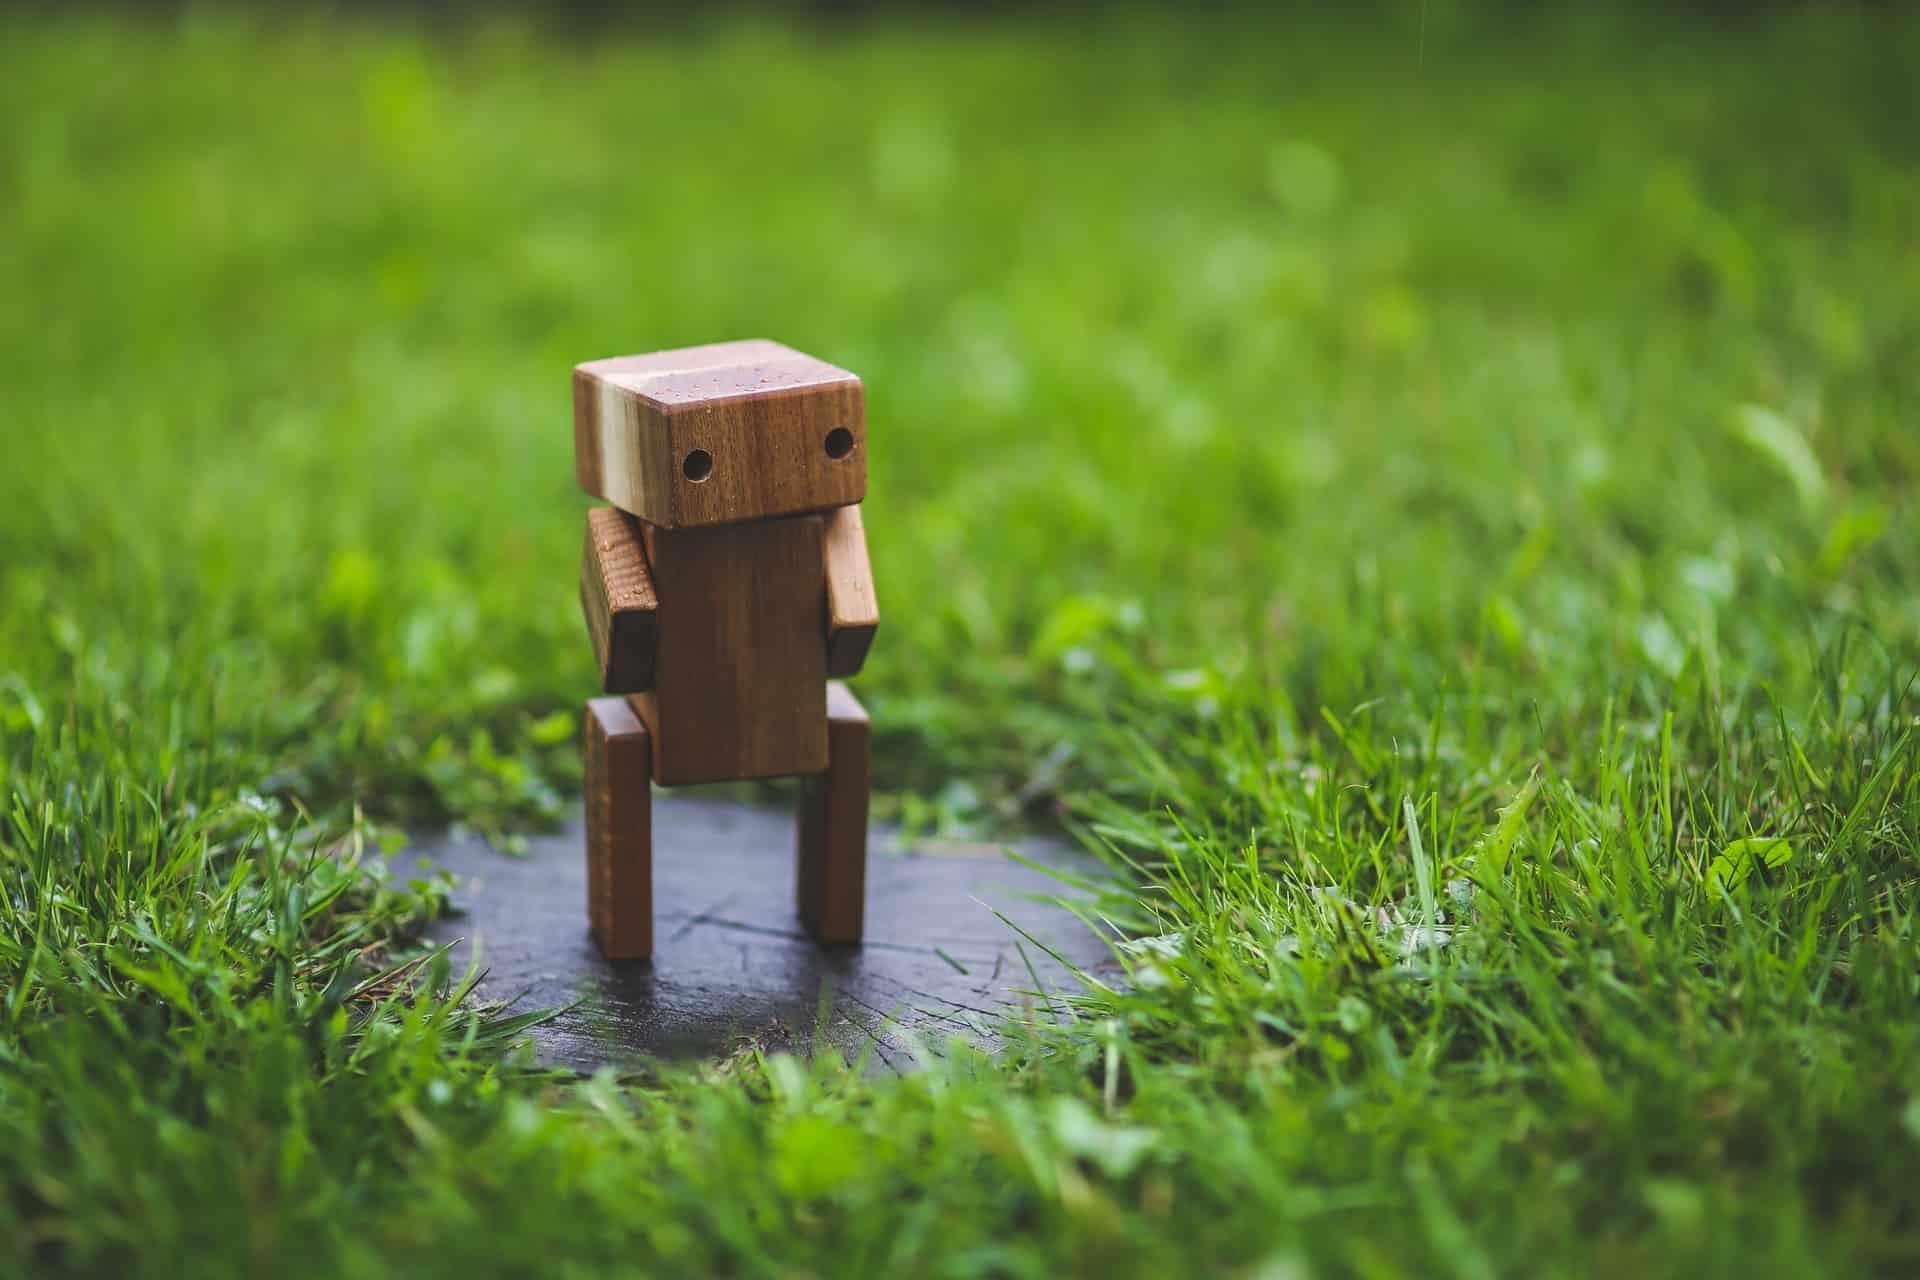 Little Toy Robot